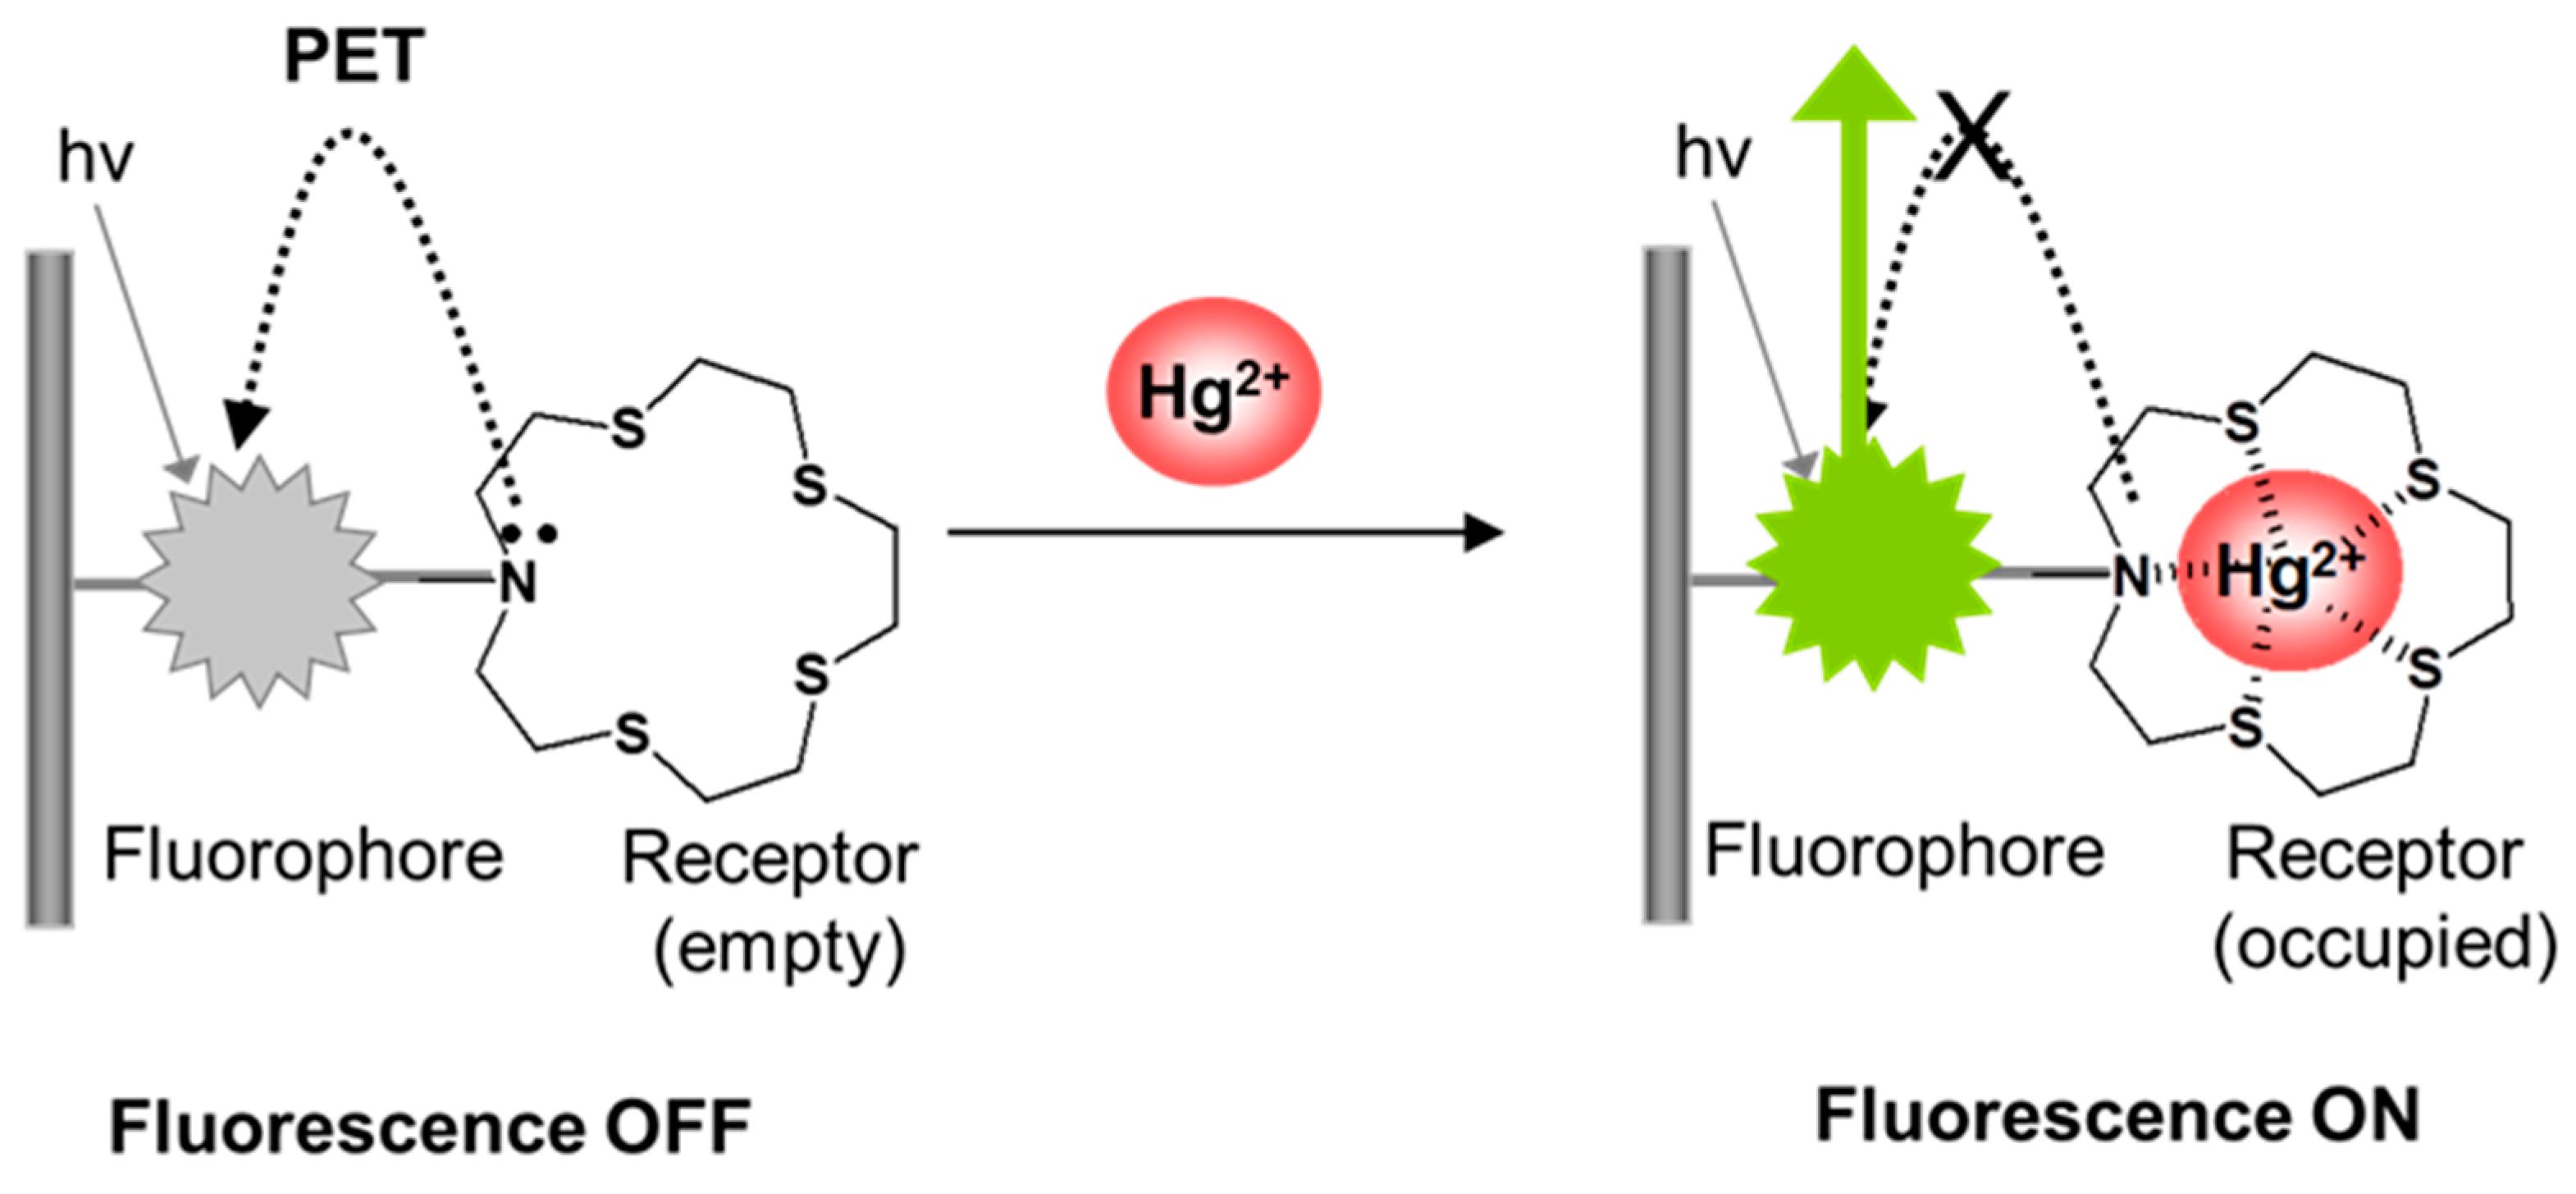 A turn-on fluorescent sensor for Hg2+ detection based on